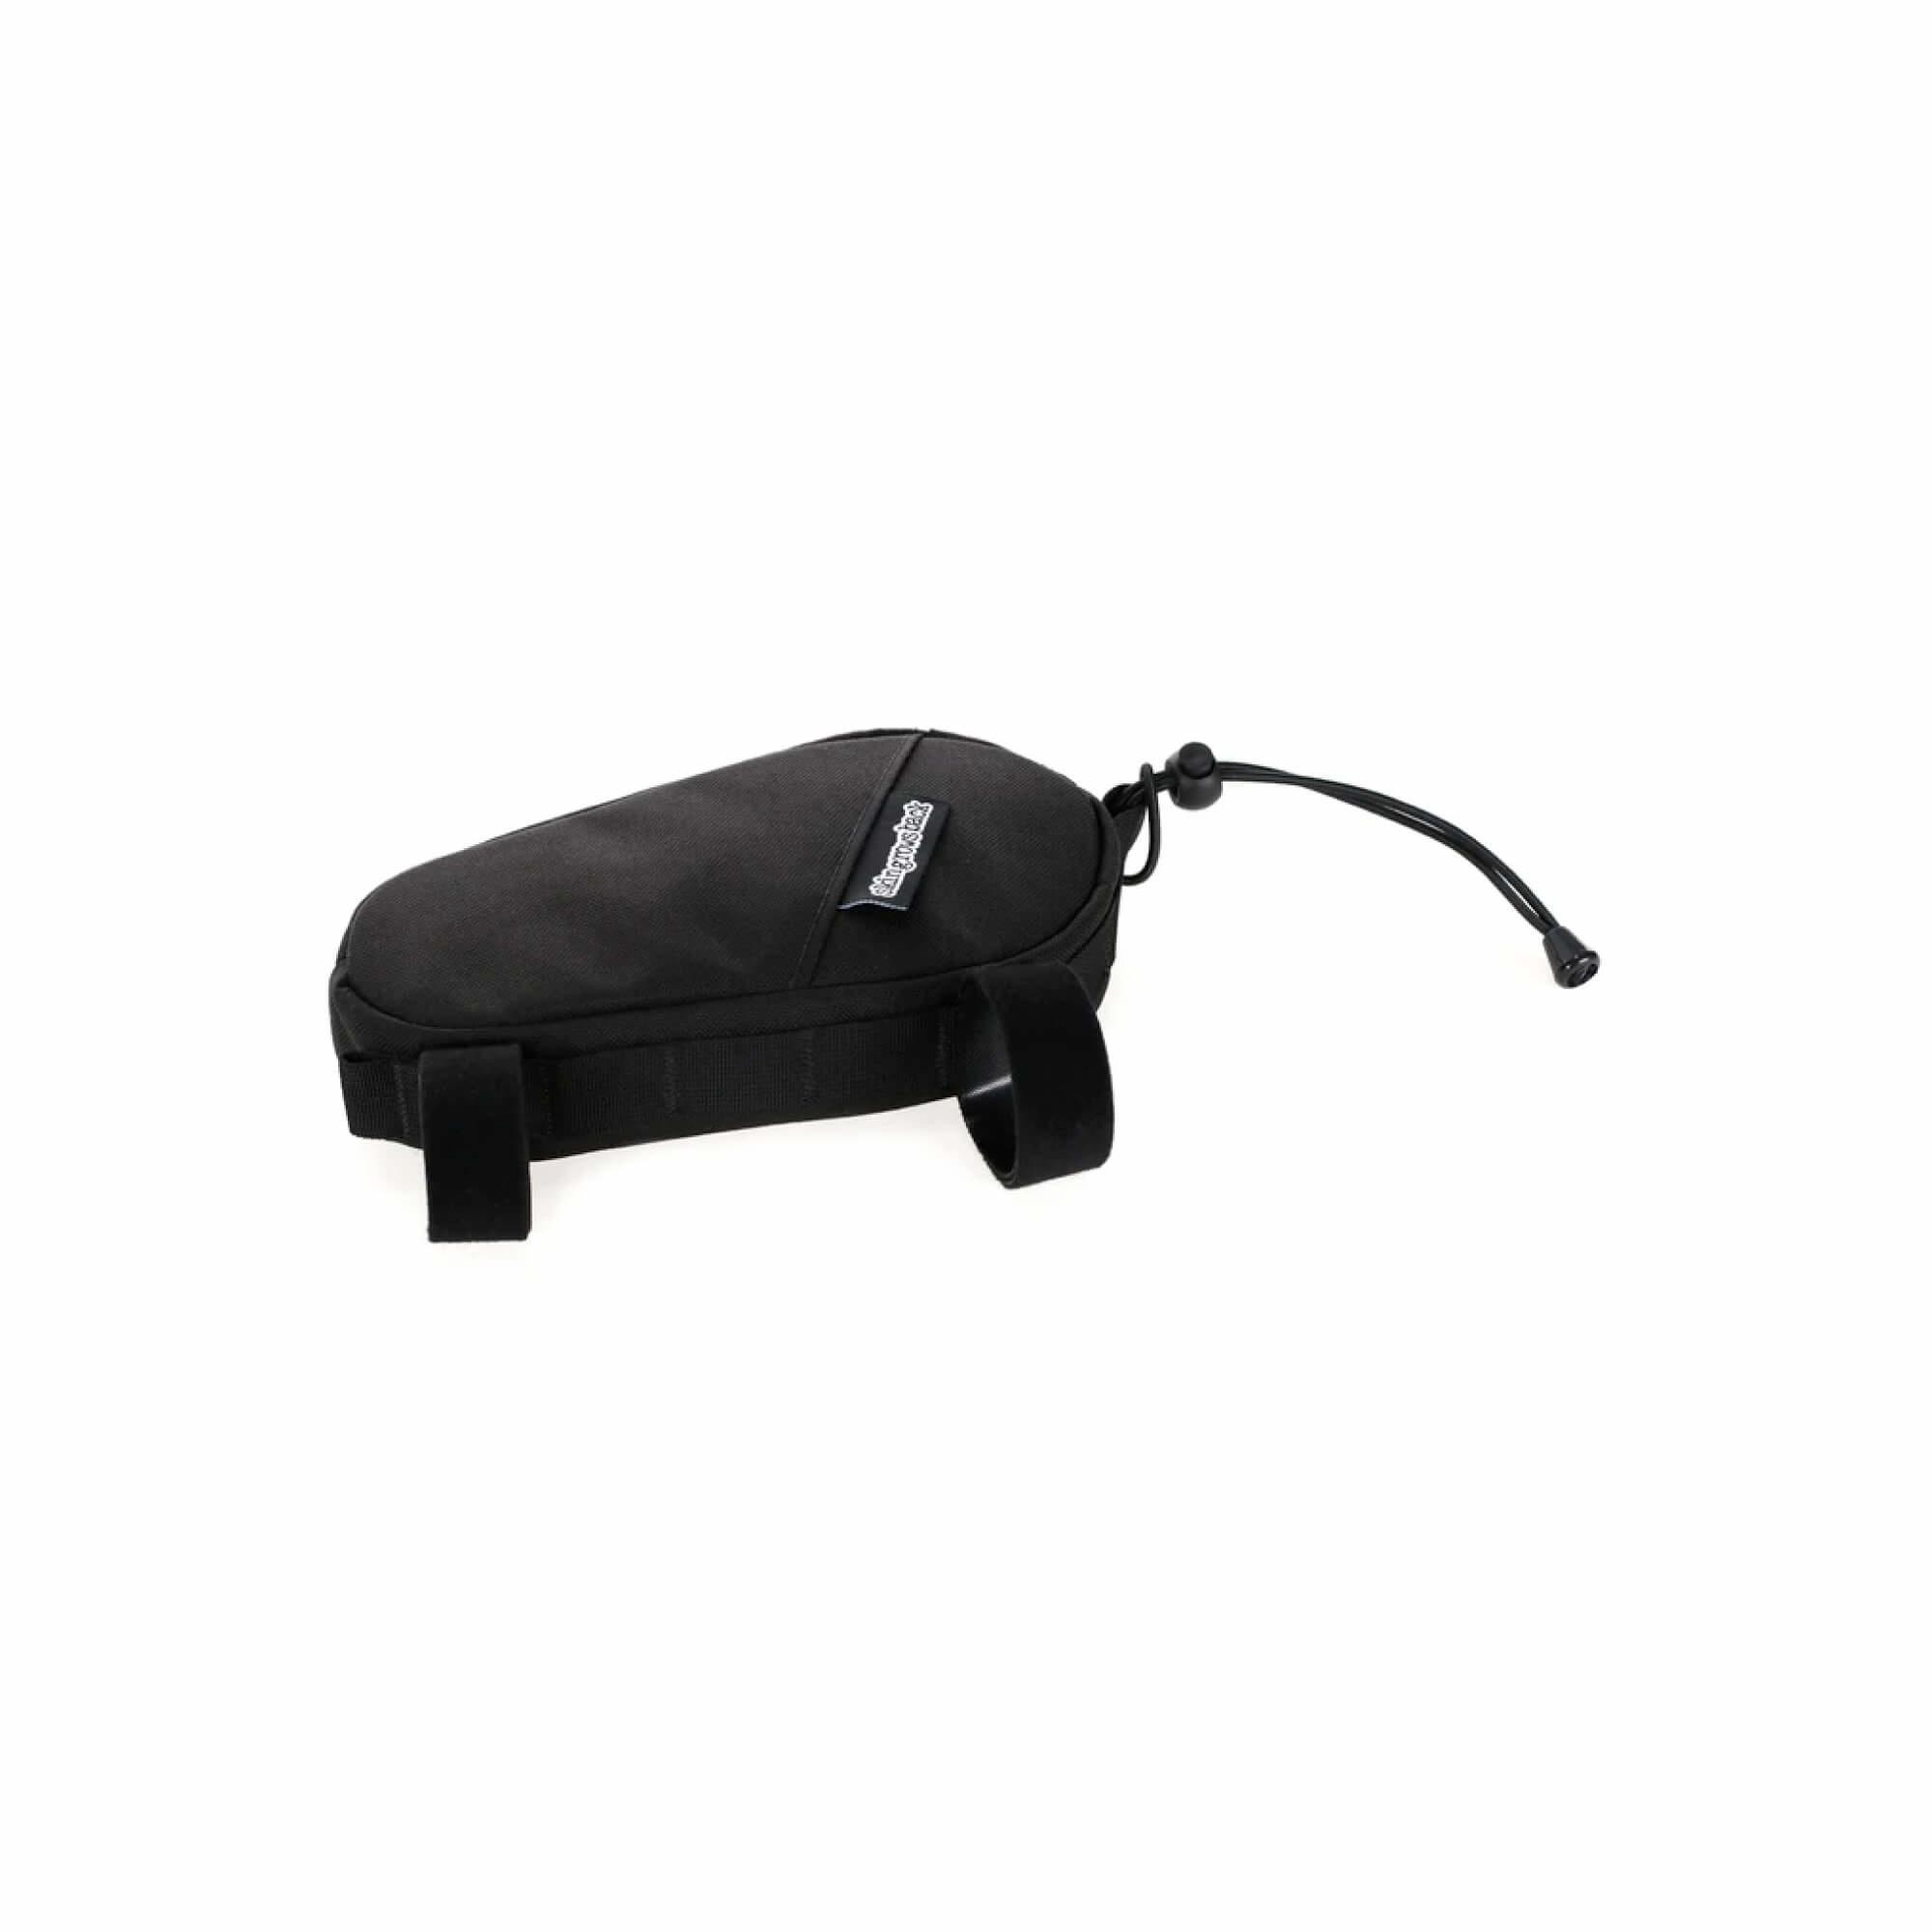 Amigo Top Tube Bag Black-8